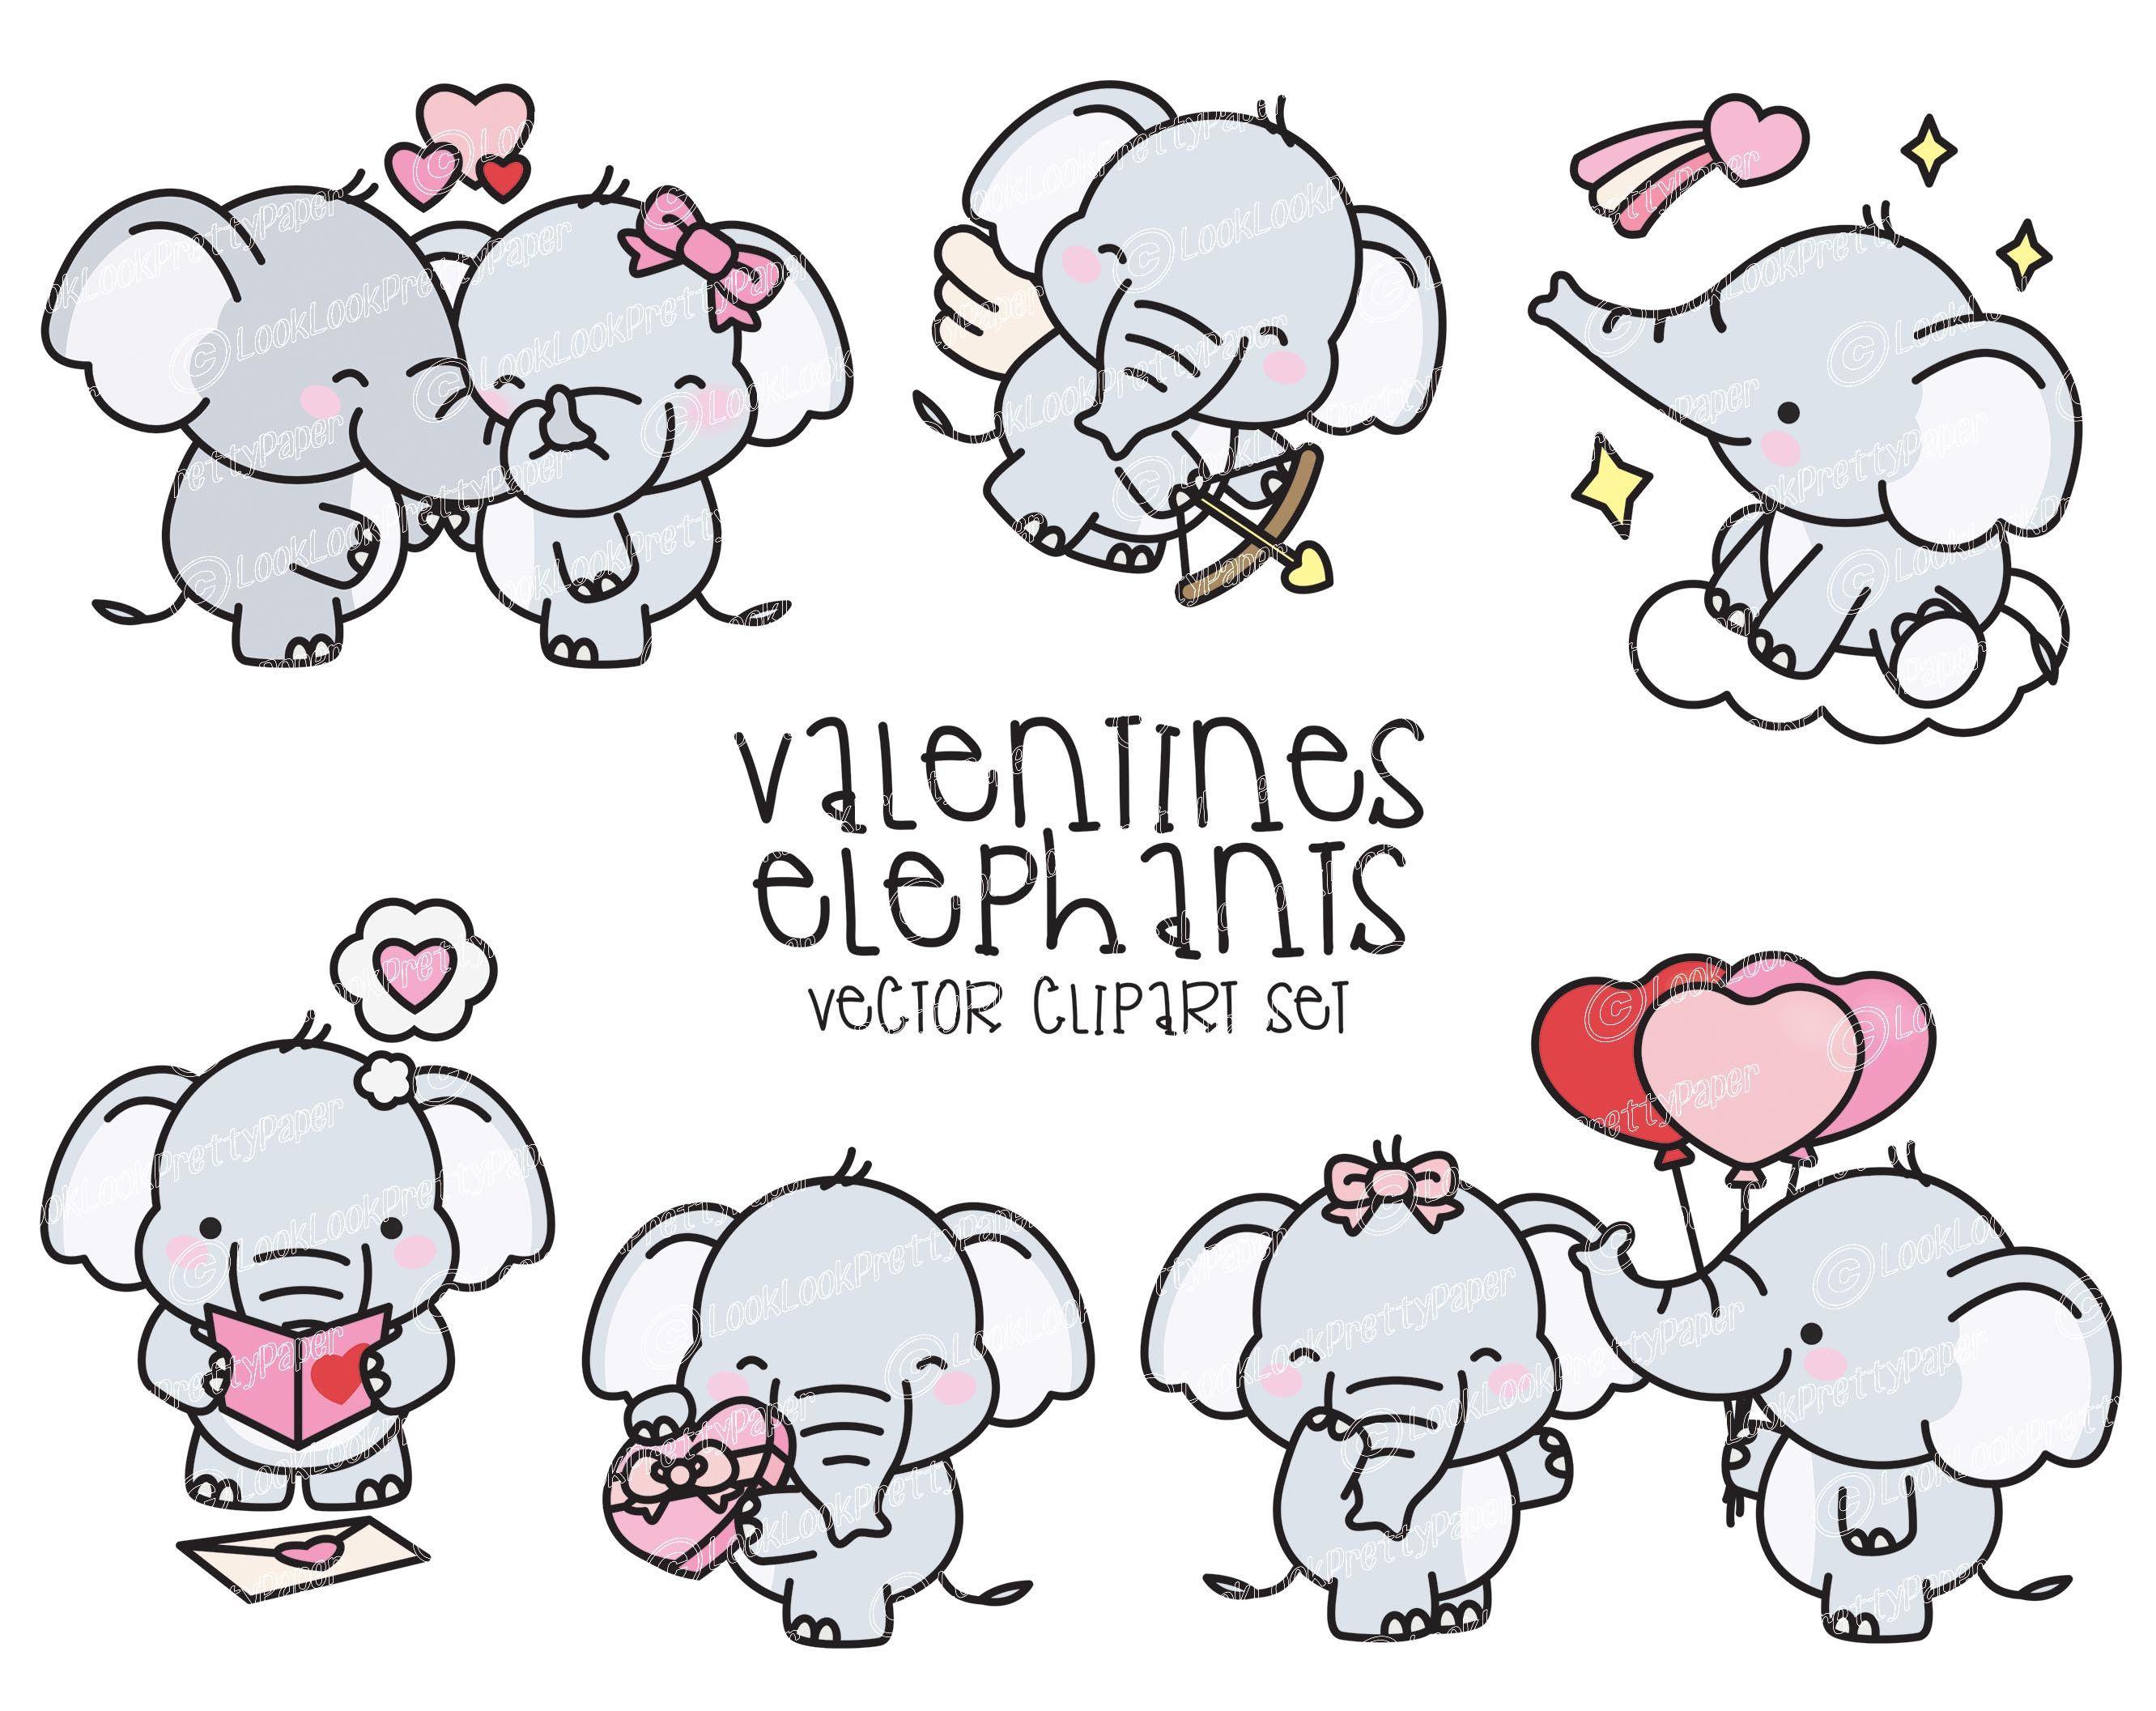 Premium Vector Clipart Kawaii Valentines Elephants Valentines